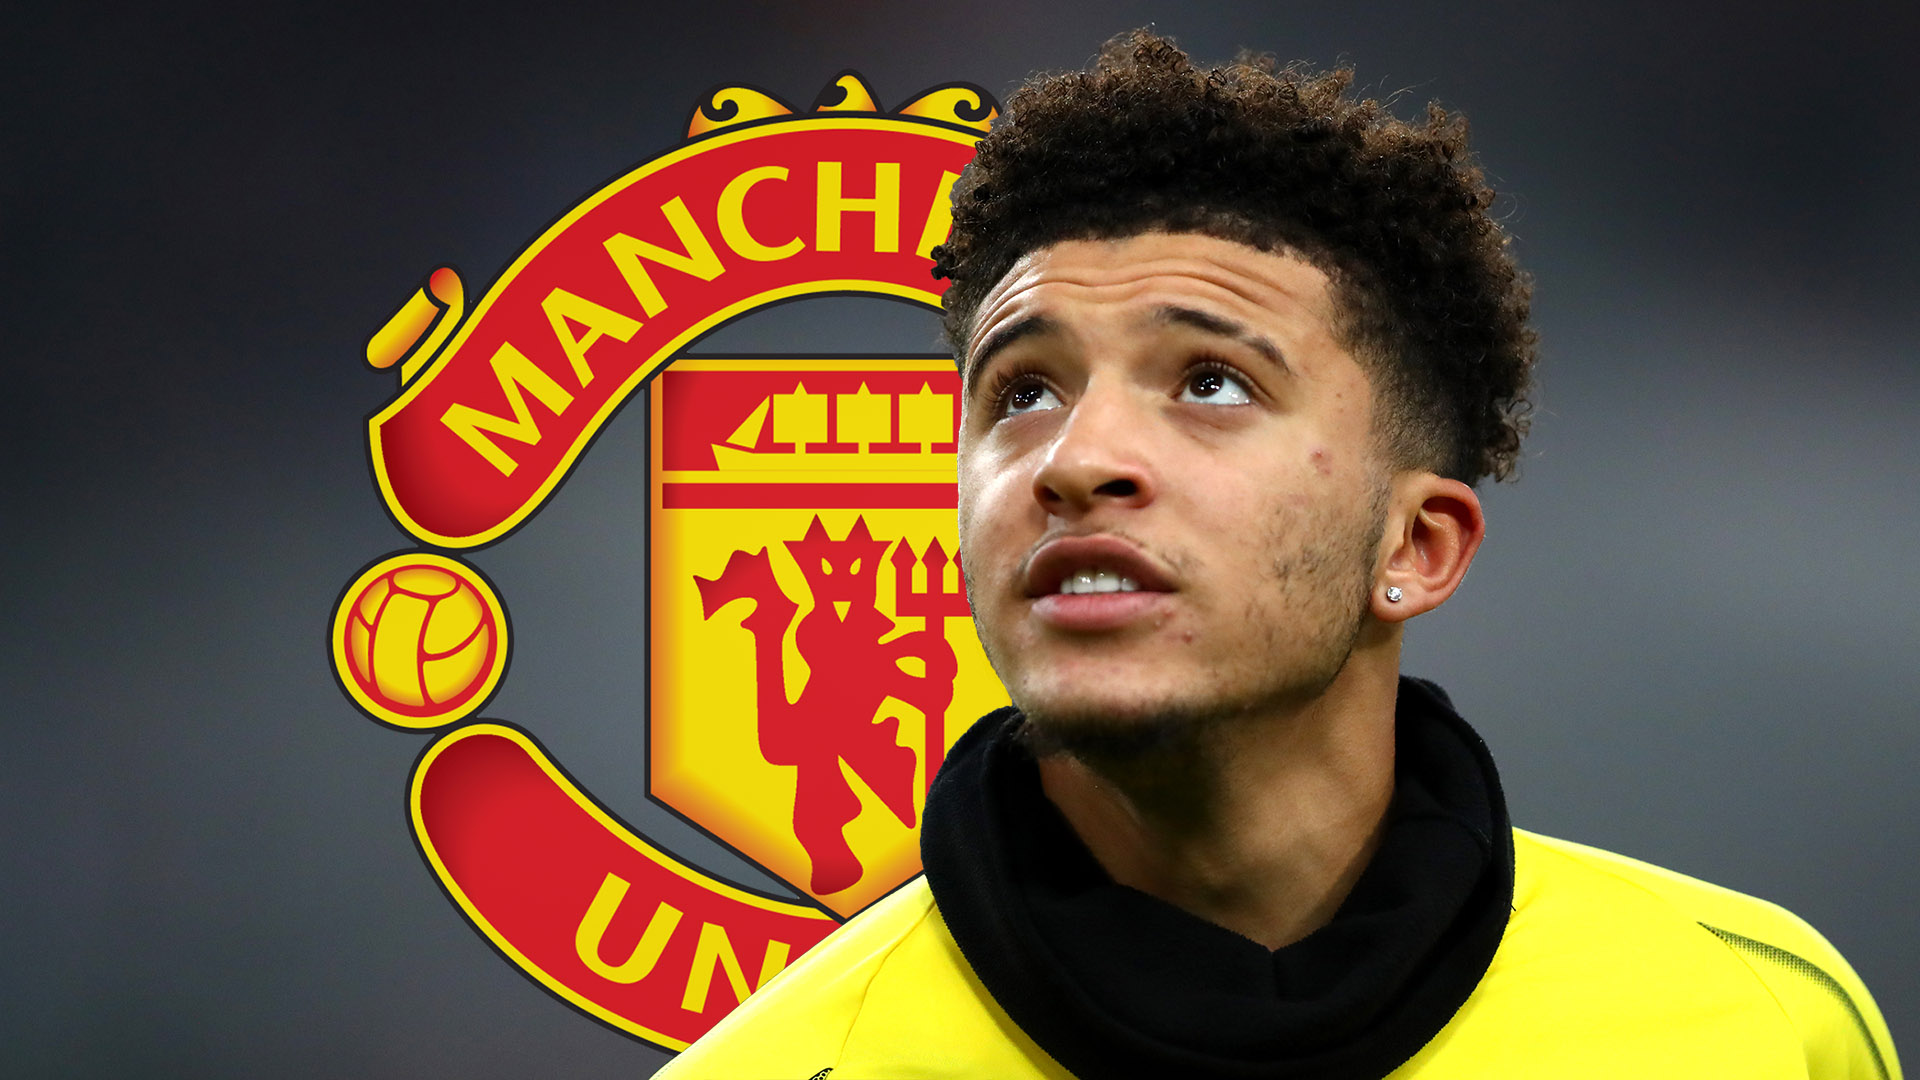 Man Utd should sign Sancho & give him No.7' – Ferdinand wants winger to  follow Ronaldo & Beckham | Goal.com